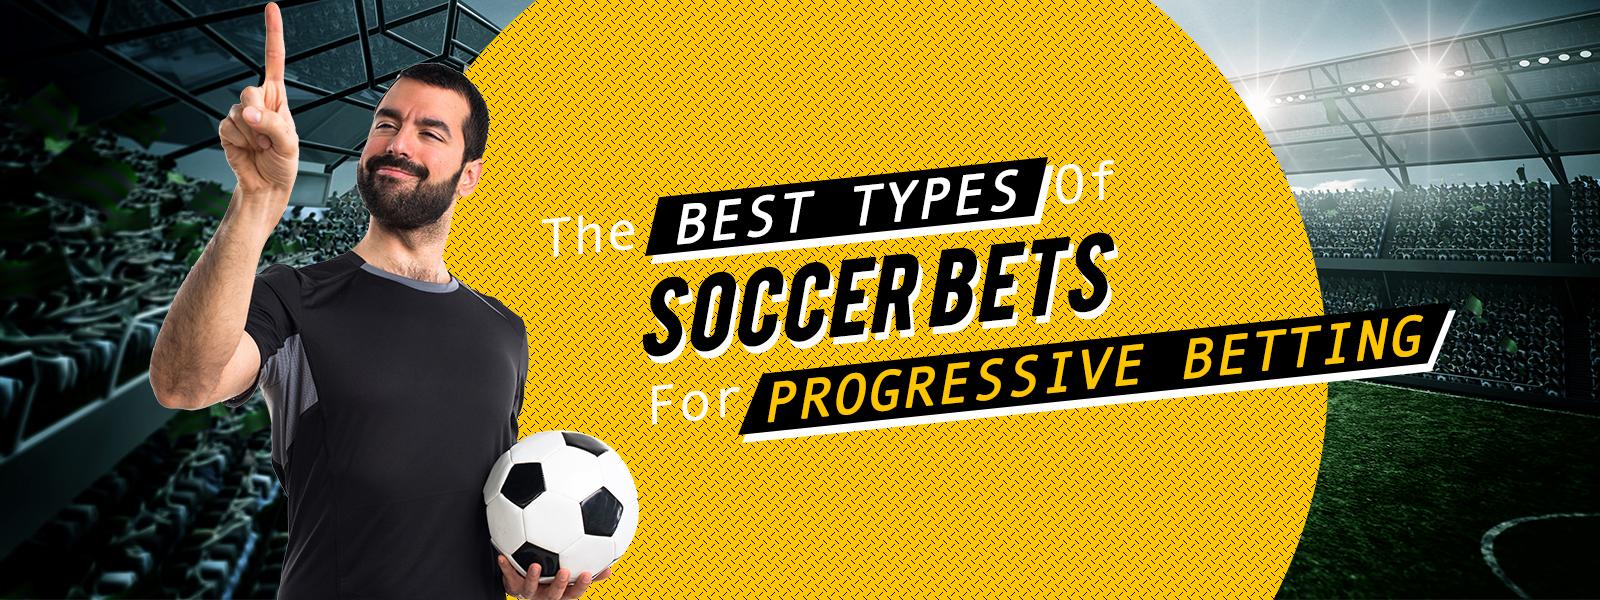 Progressive betting soccer predictions total goals scored betting on sports